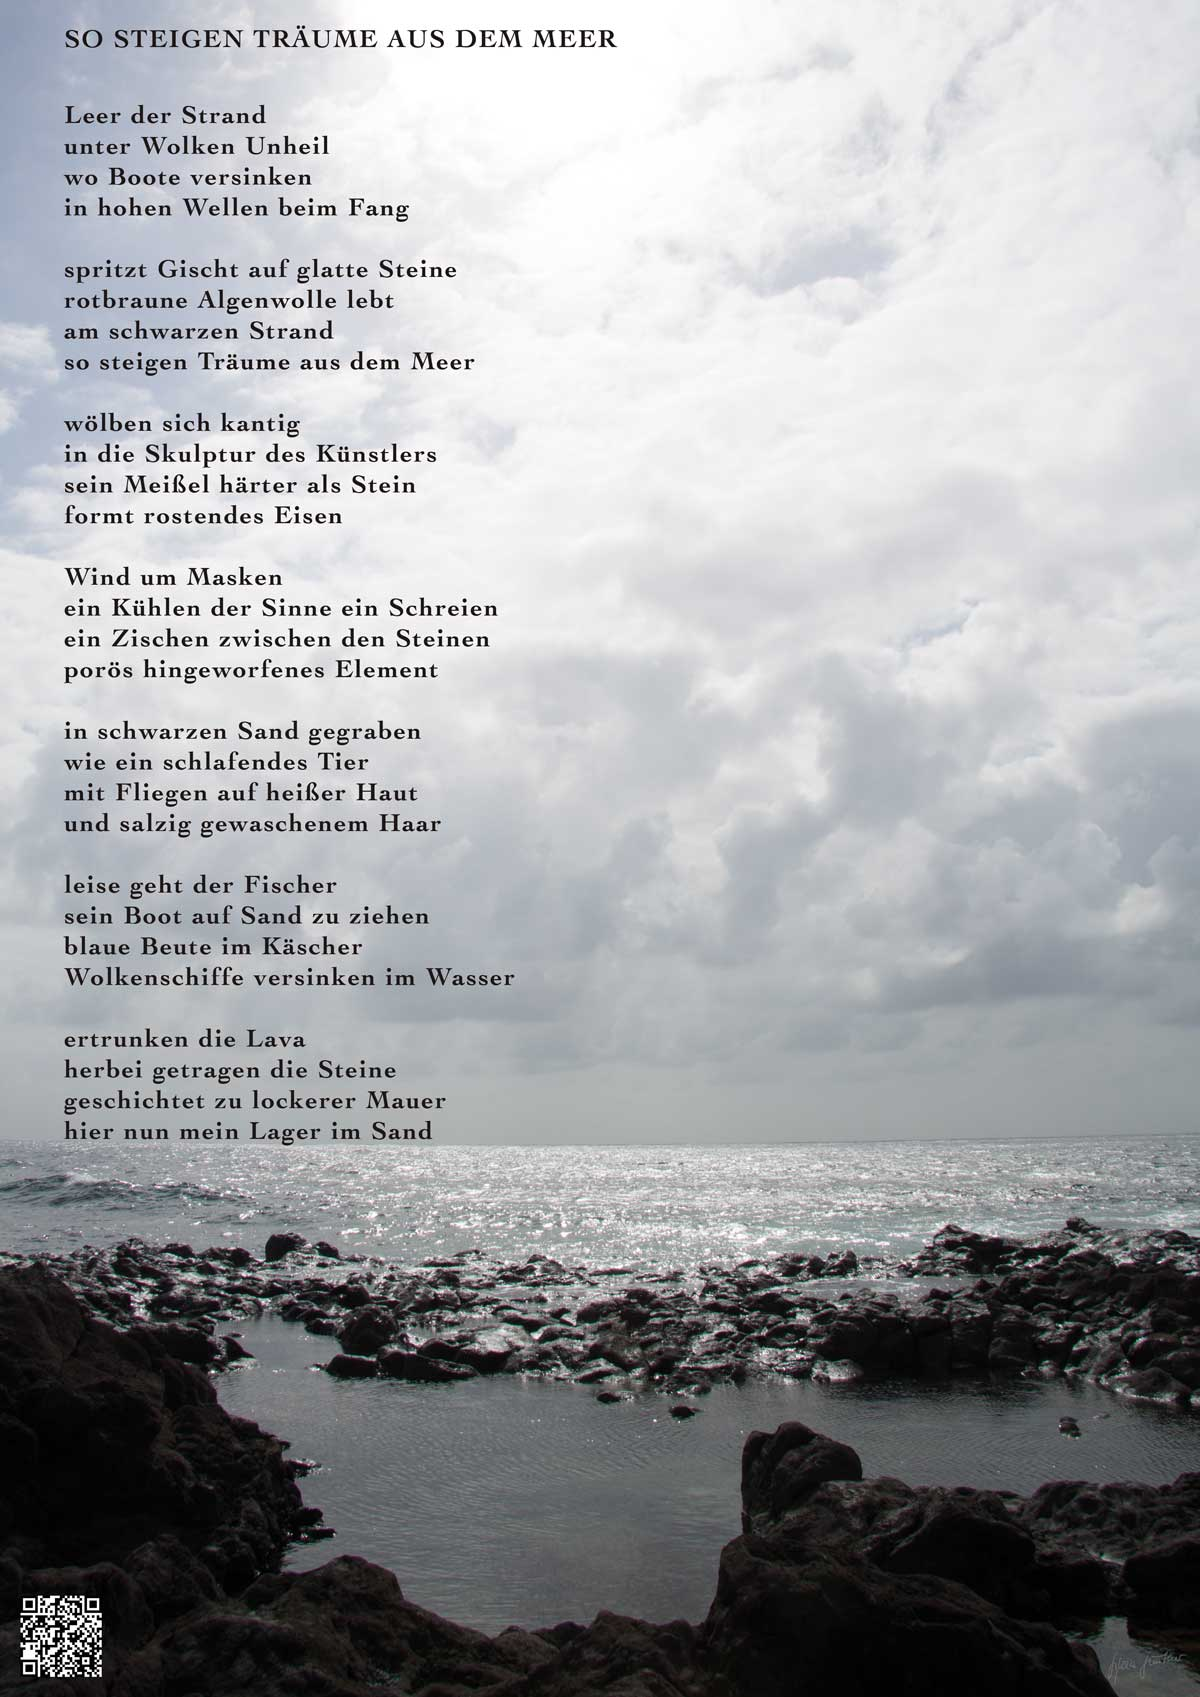 Soundpics: 68 So steigen Träume aus dem Meer